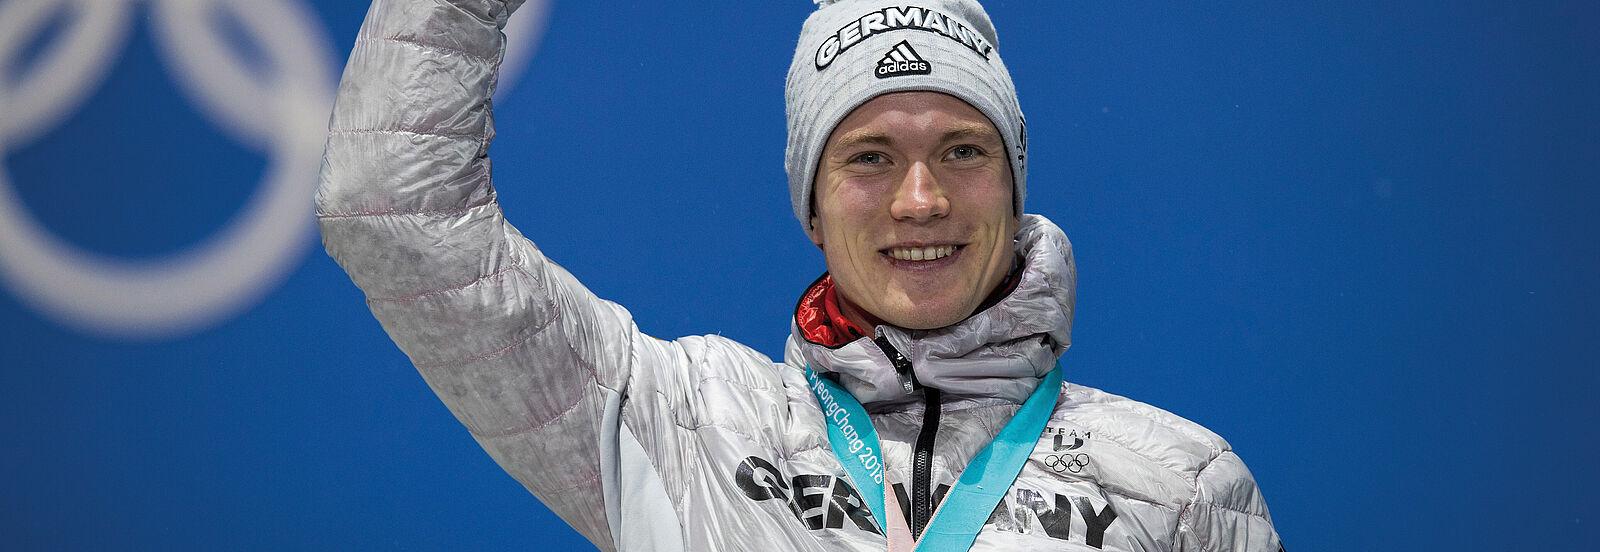 Benedikt Doll: Bronze-Medaillen-Gewinner bei den Olympischen Spielen 2018. Foto: NordicFocus.